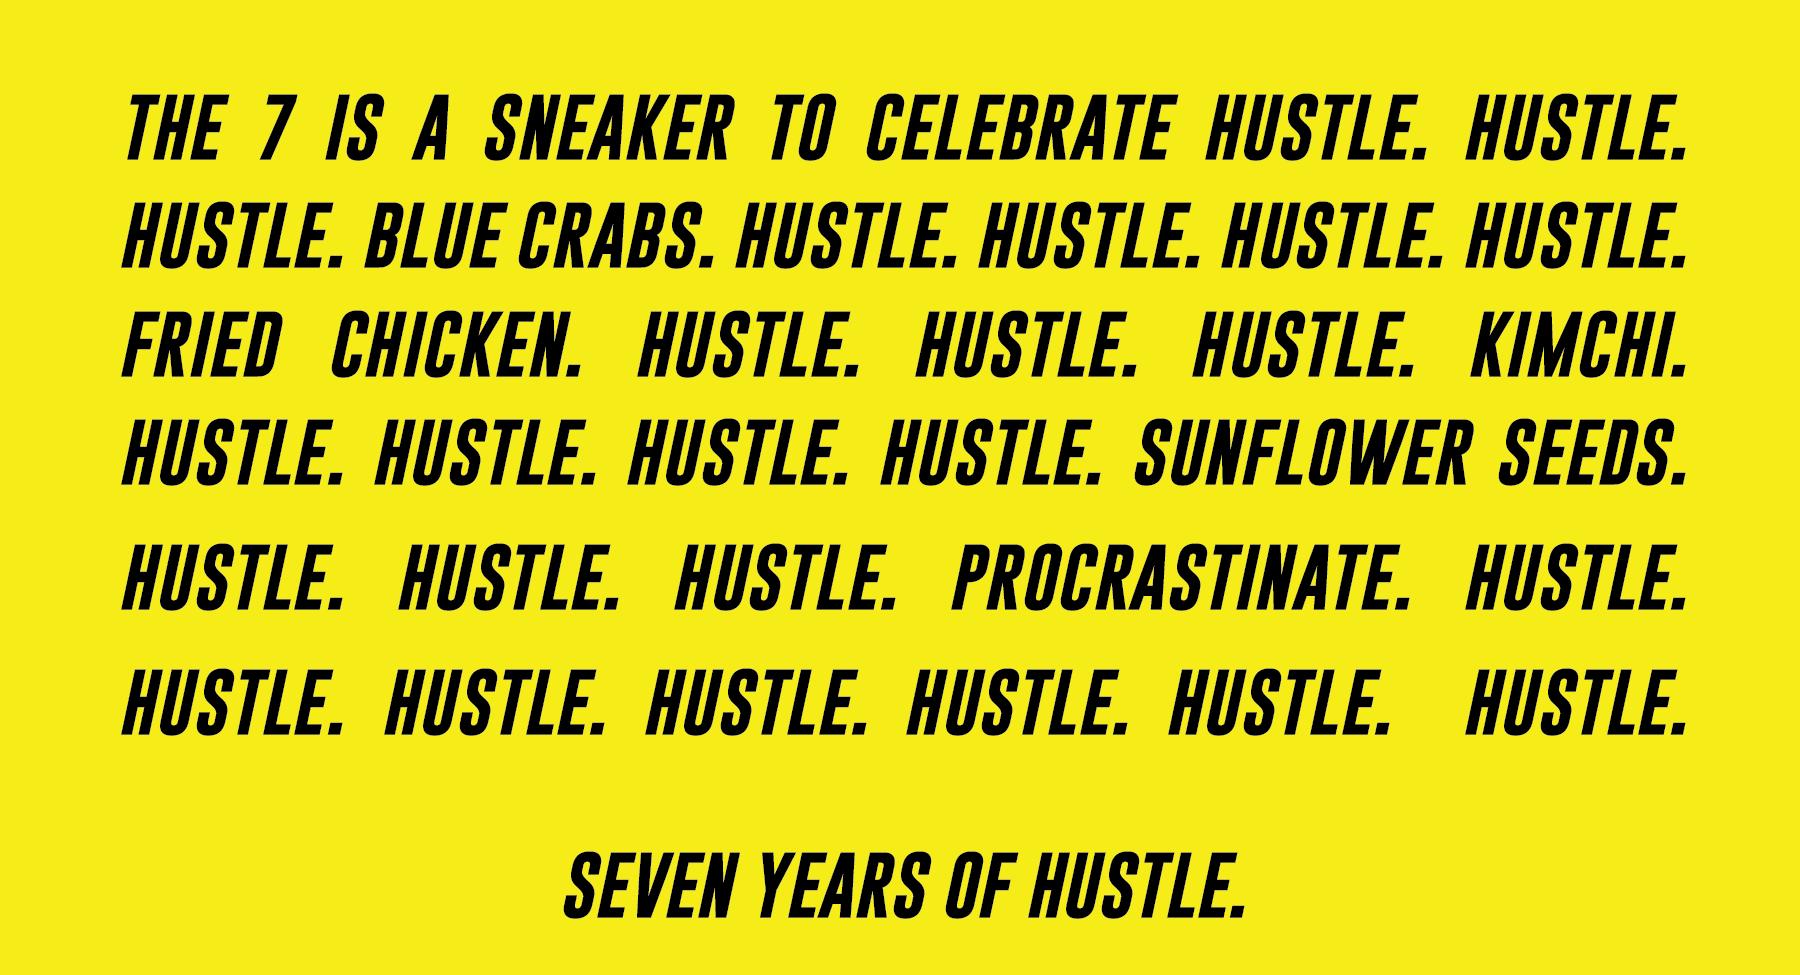 hustle-03.png